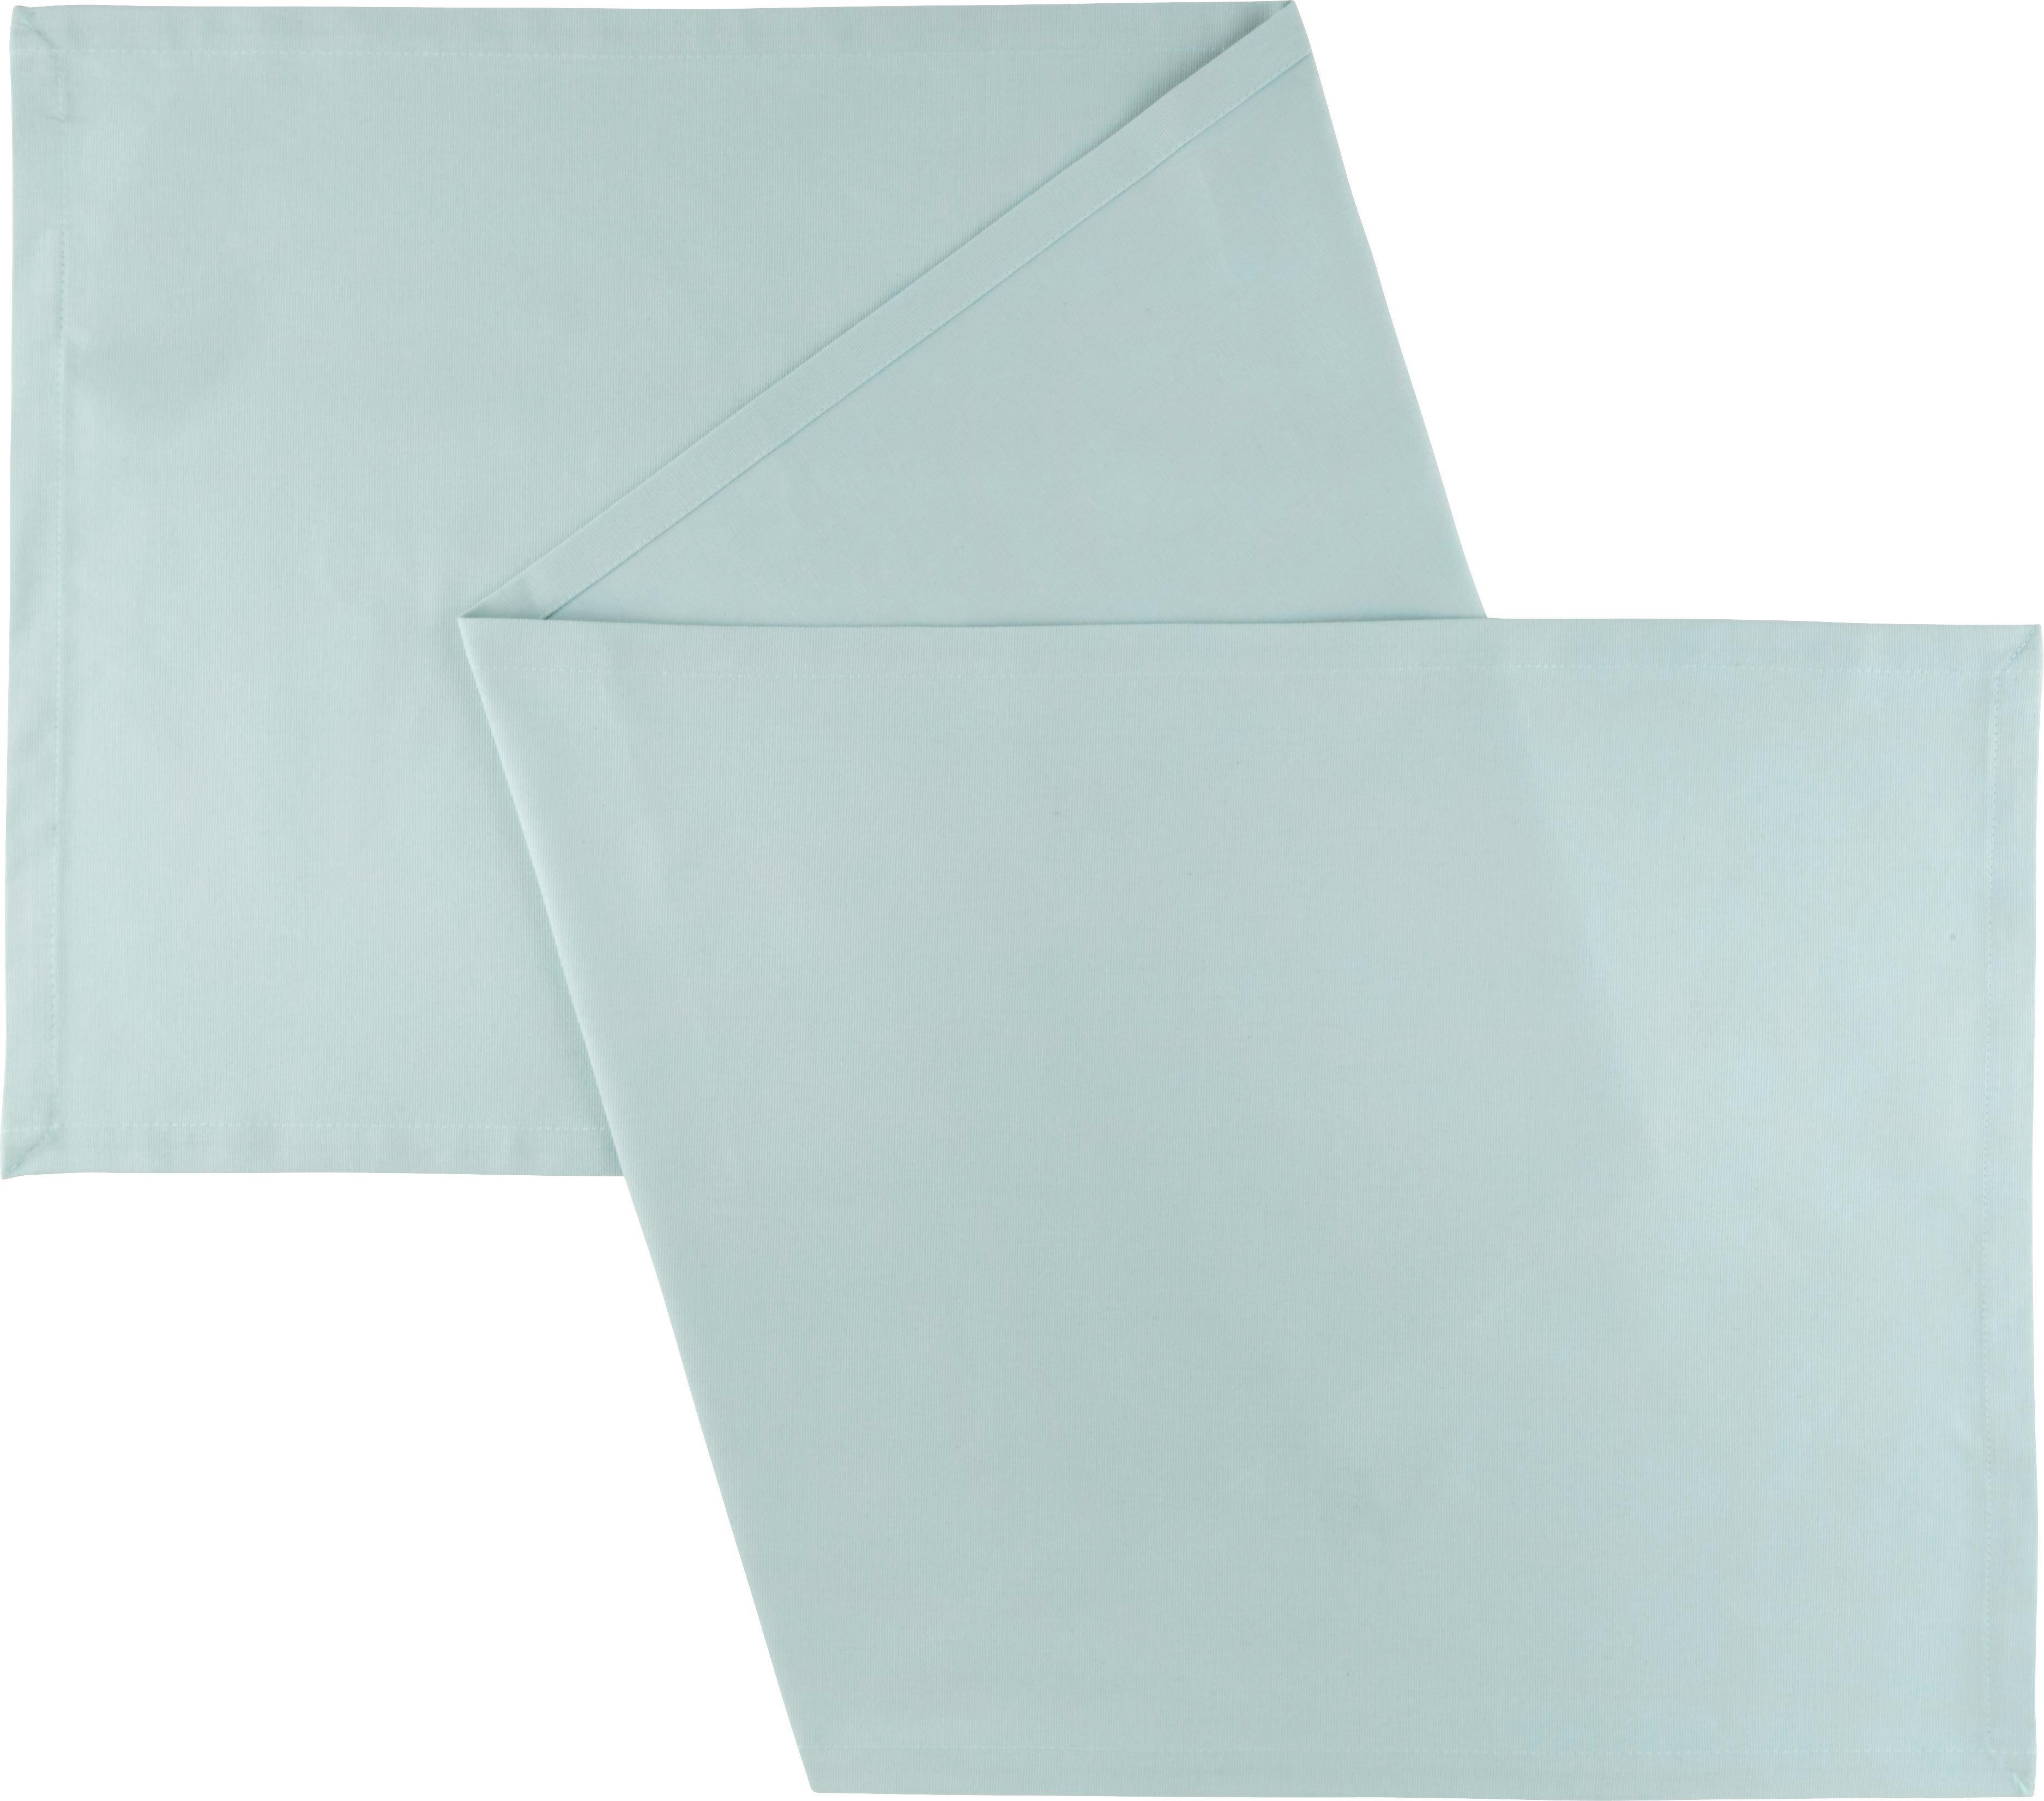 Tischläufer Steffi in Mintgrün - Mintgrün, Textil (45/240cm) - MÖMAX modern living